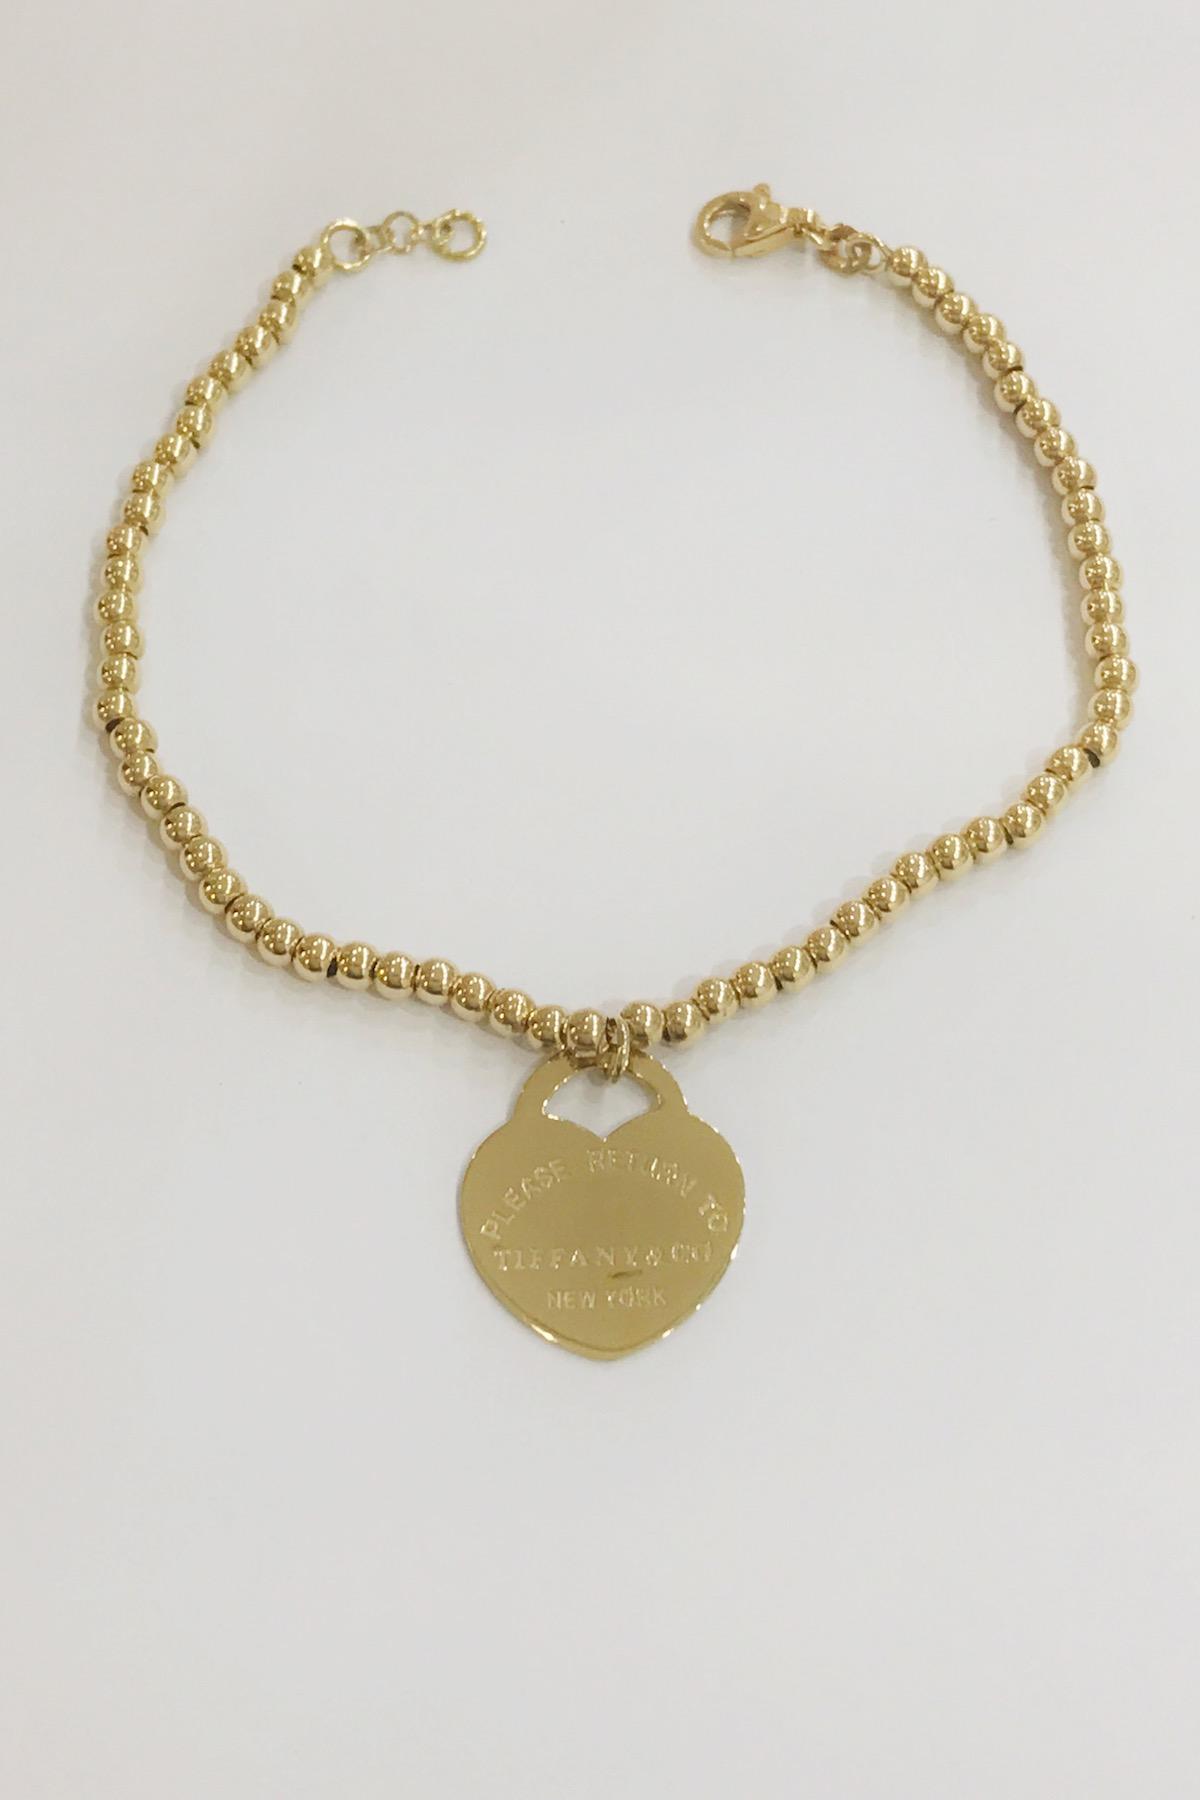 18k Yellow gold Tiffany & Co